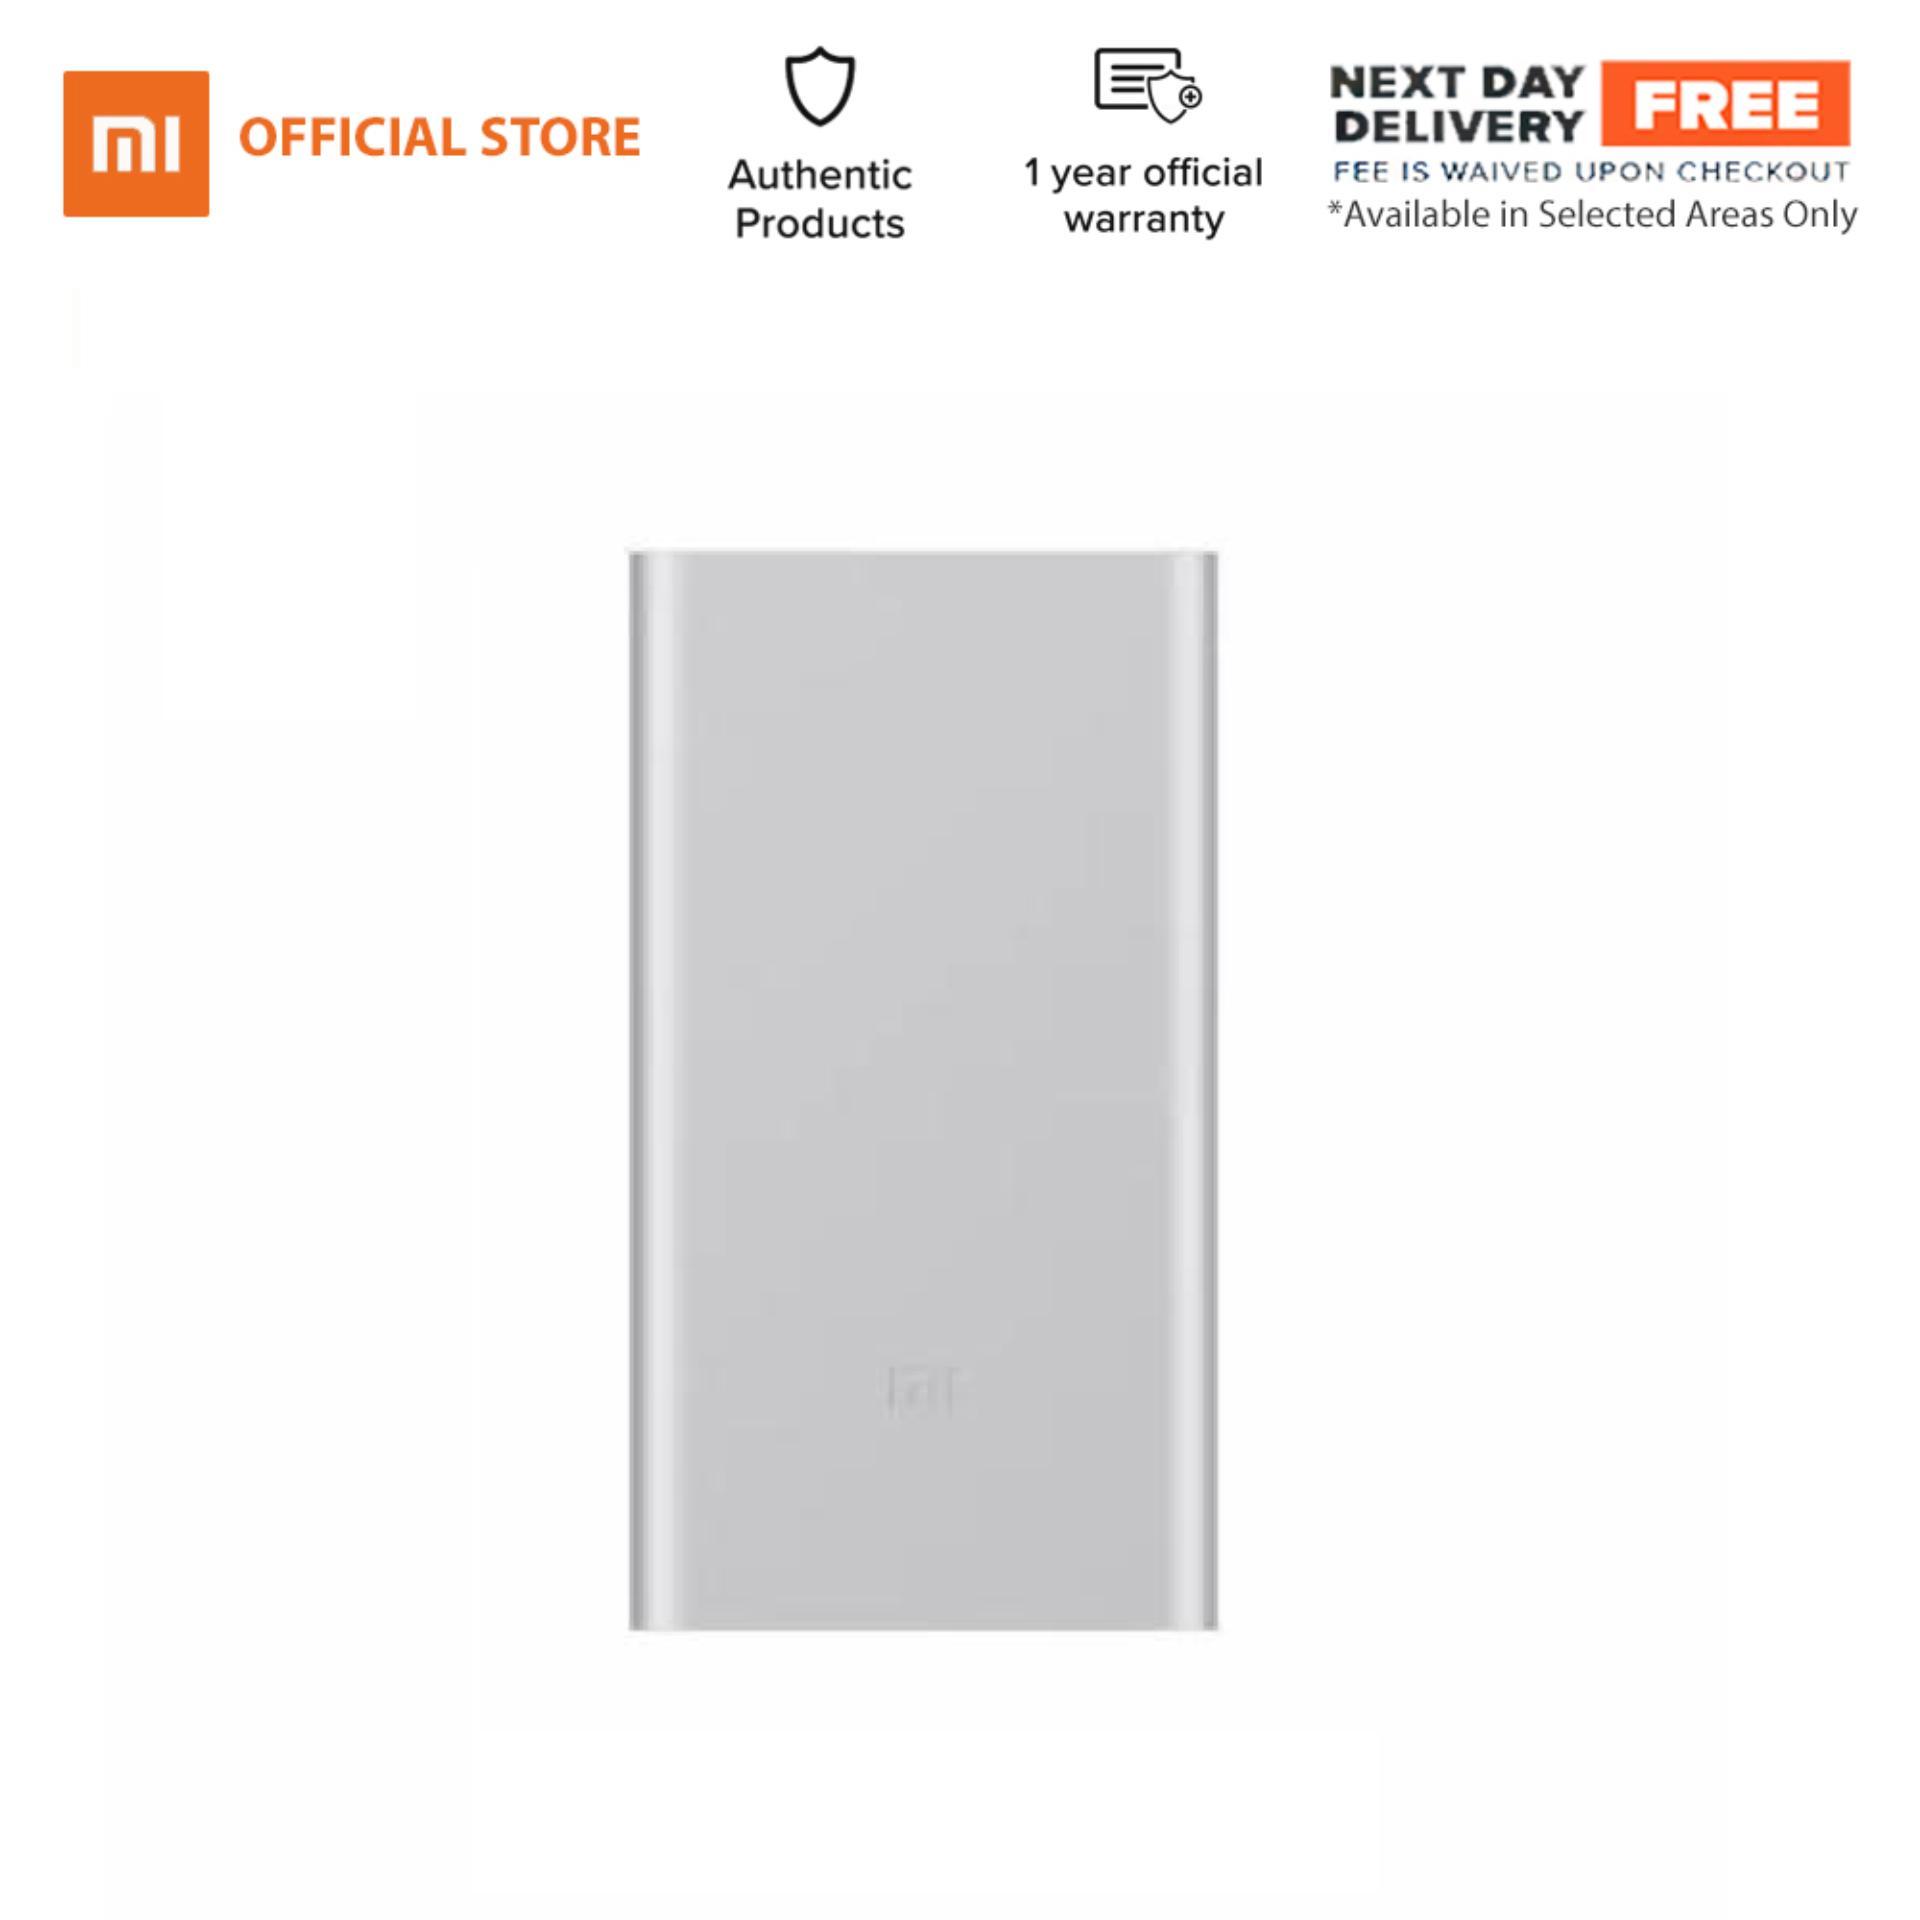 Xiaomi Philippines Xiaomi price list Cellphone Speaker & Phone Accessories for sale